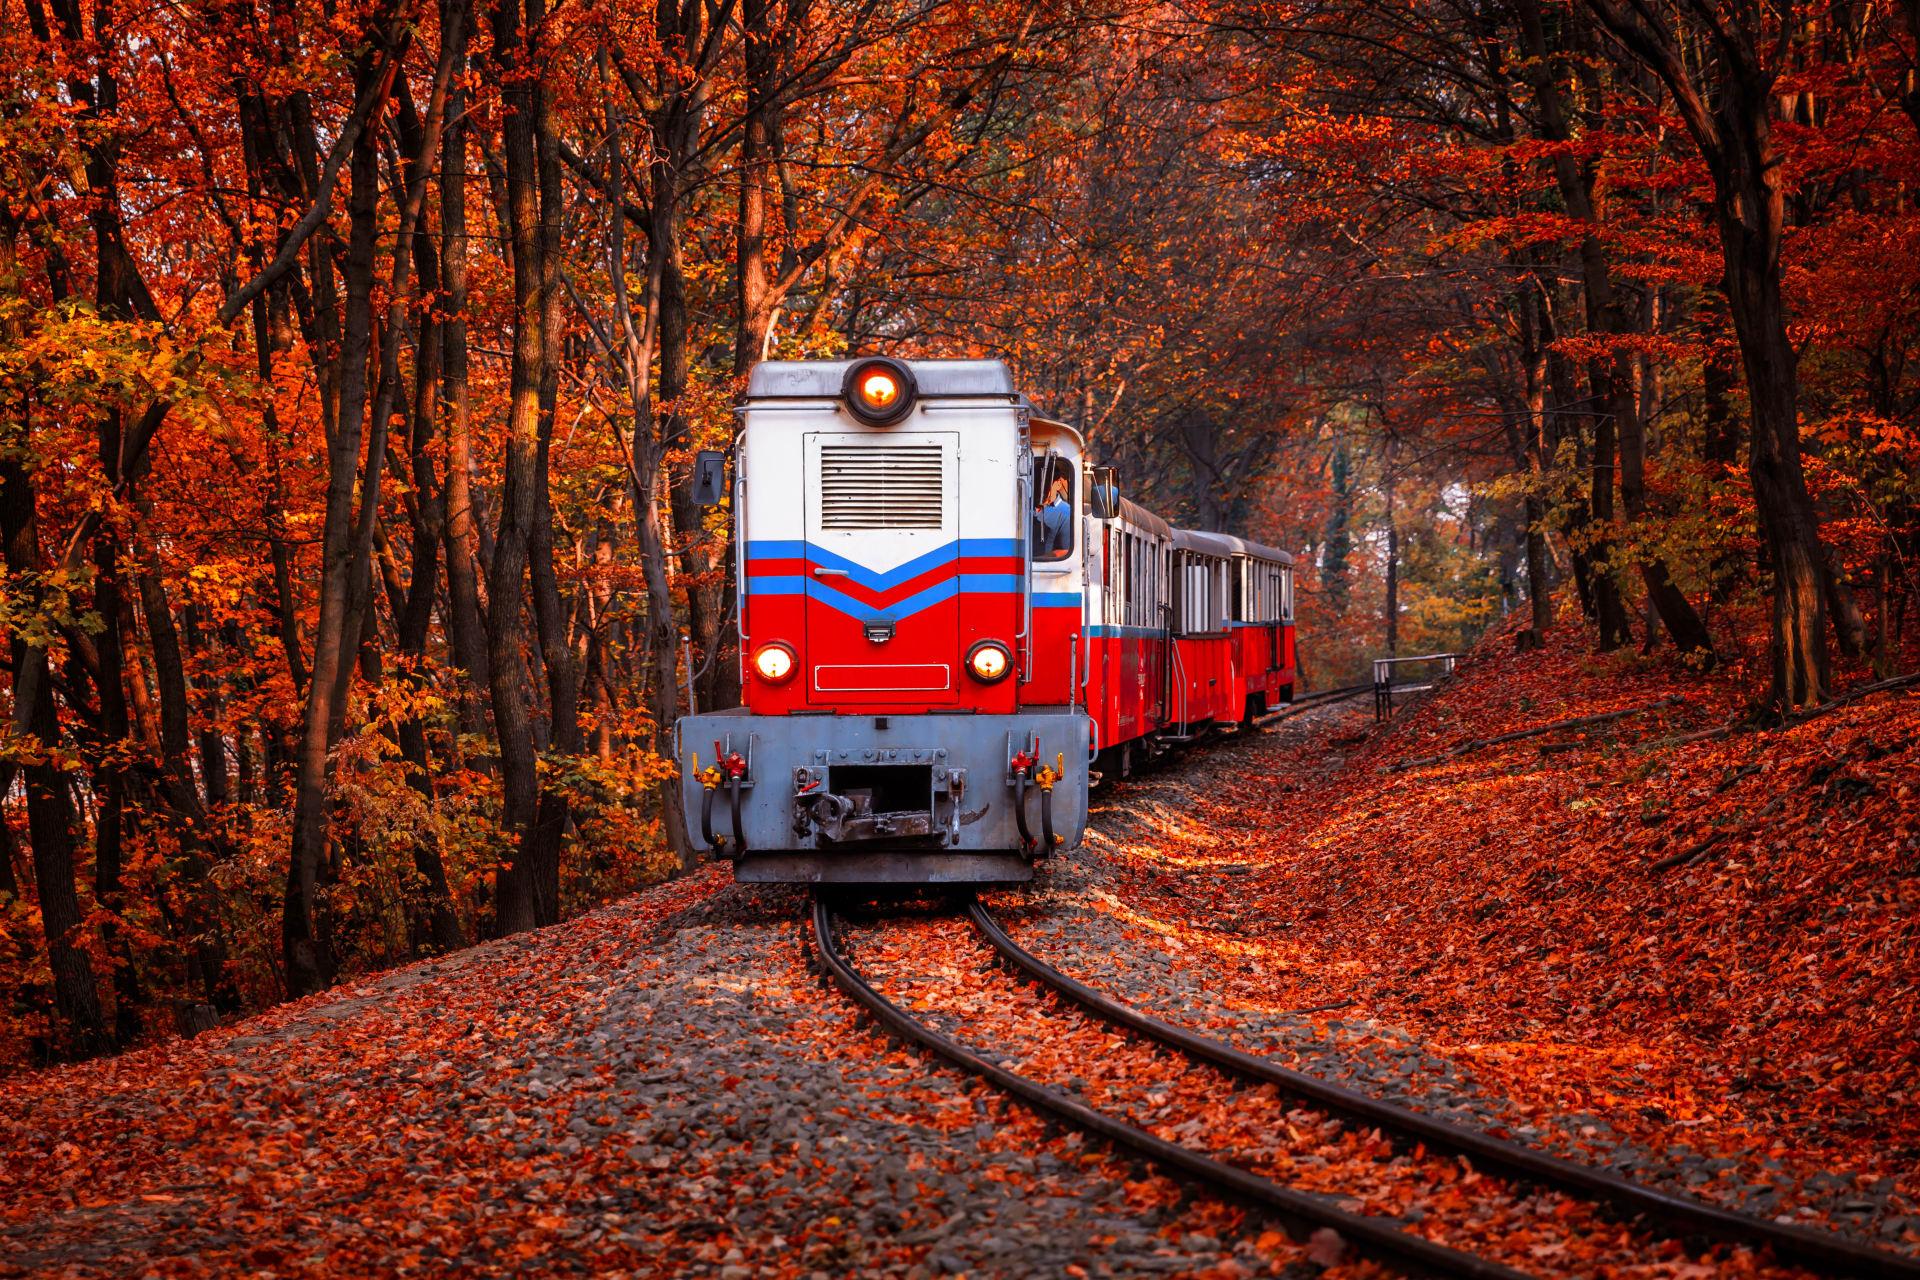 Budapest - Budapest Limited Series: Children's Railway